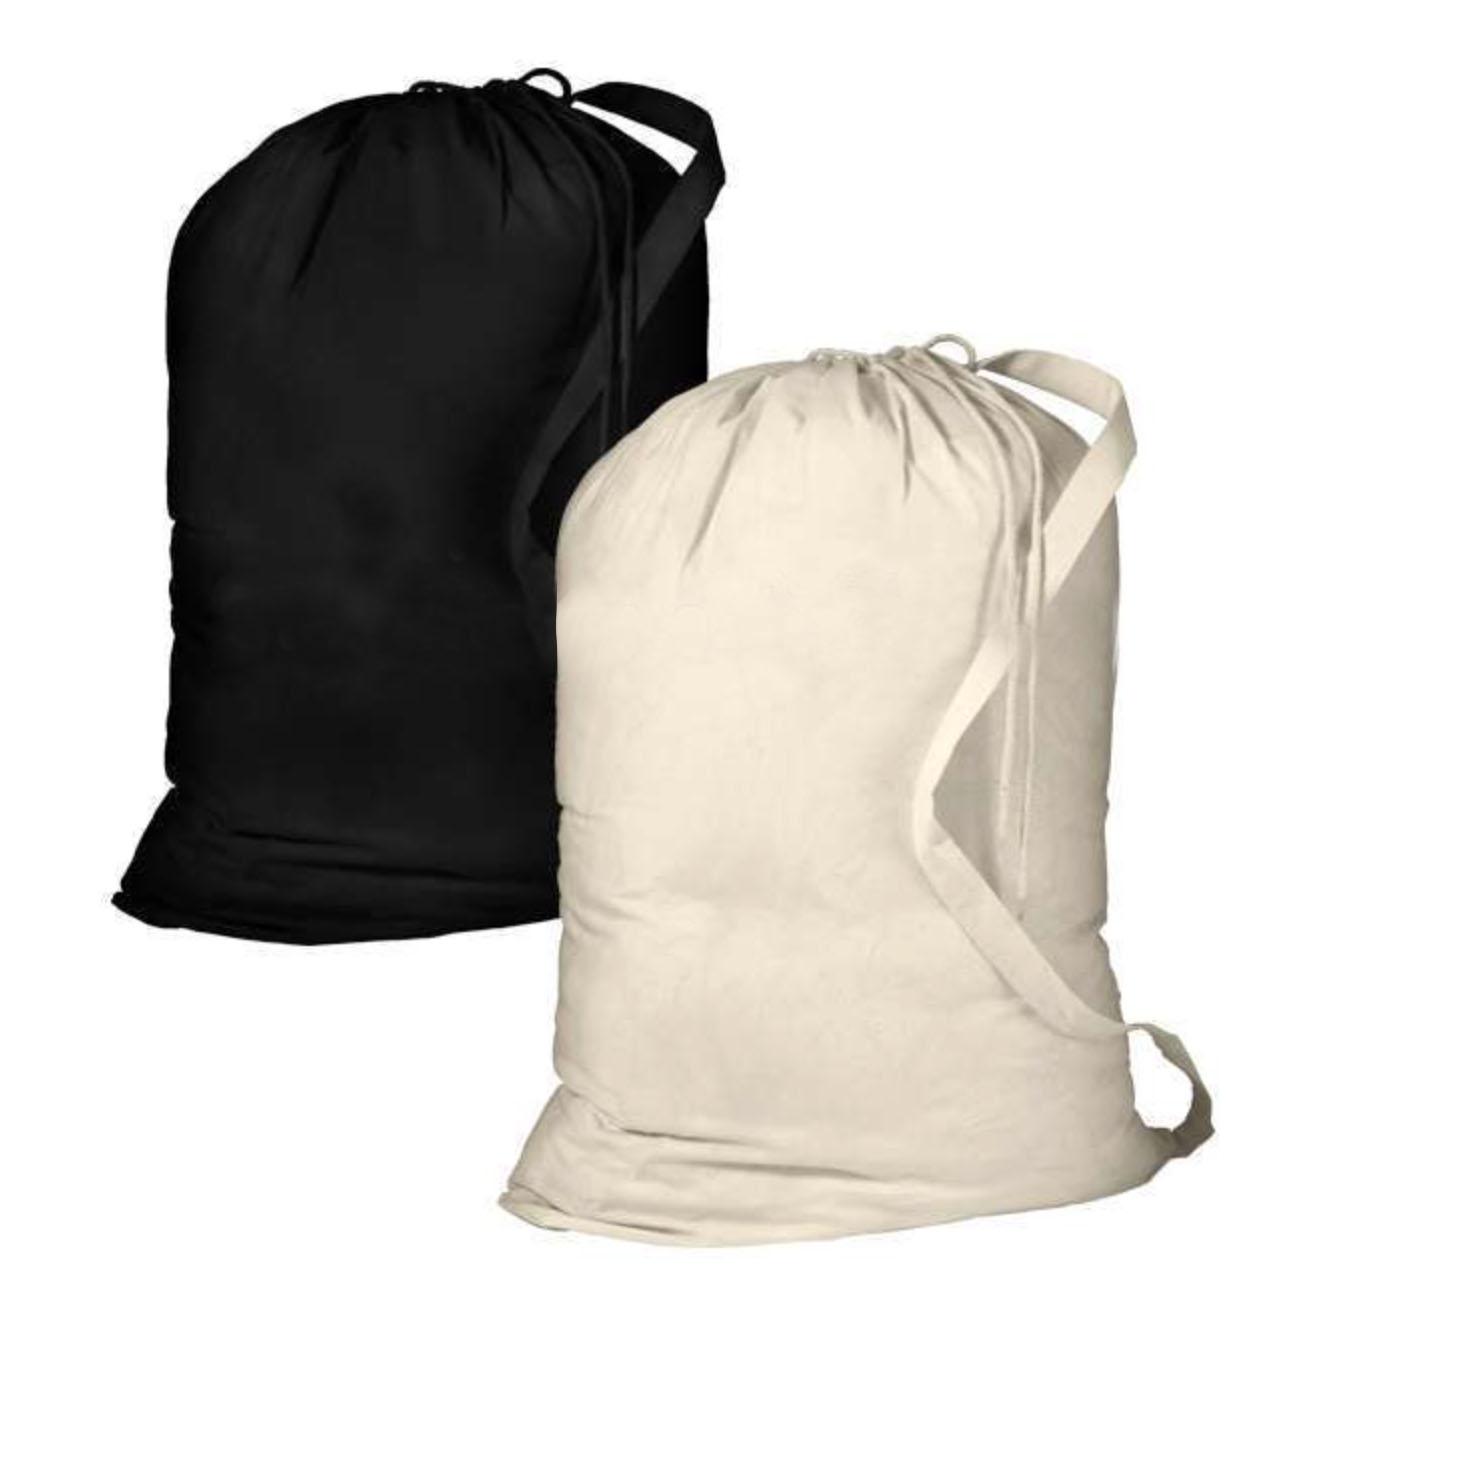 cotton drawstring duffle bag